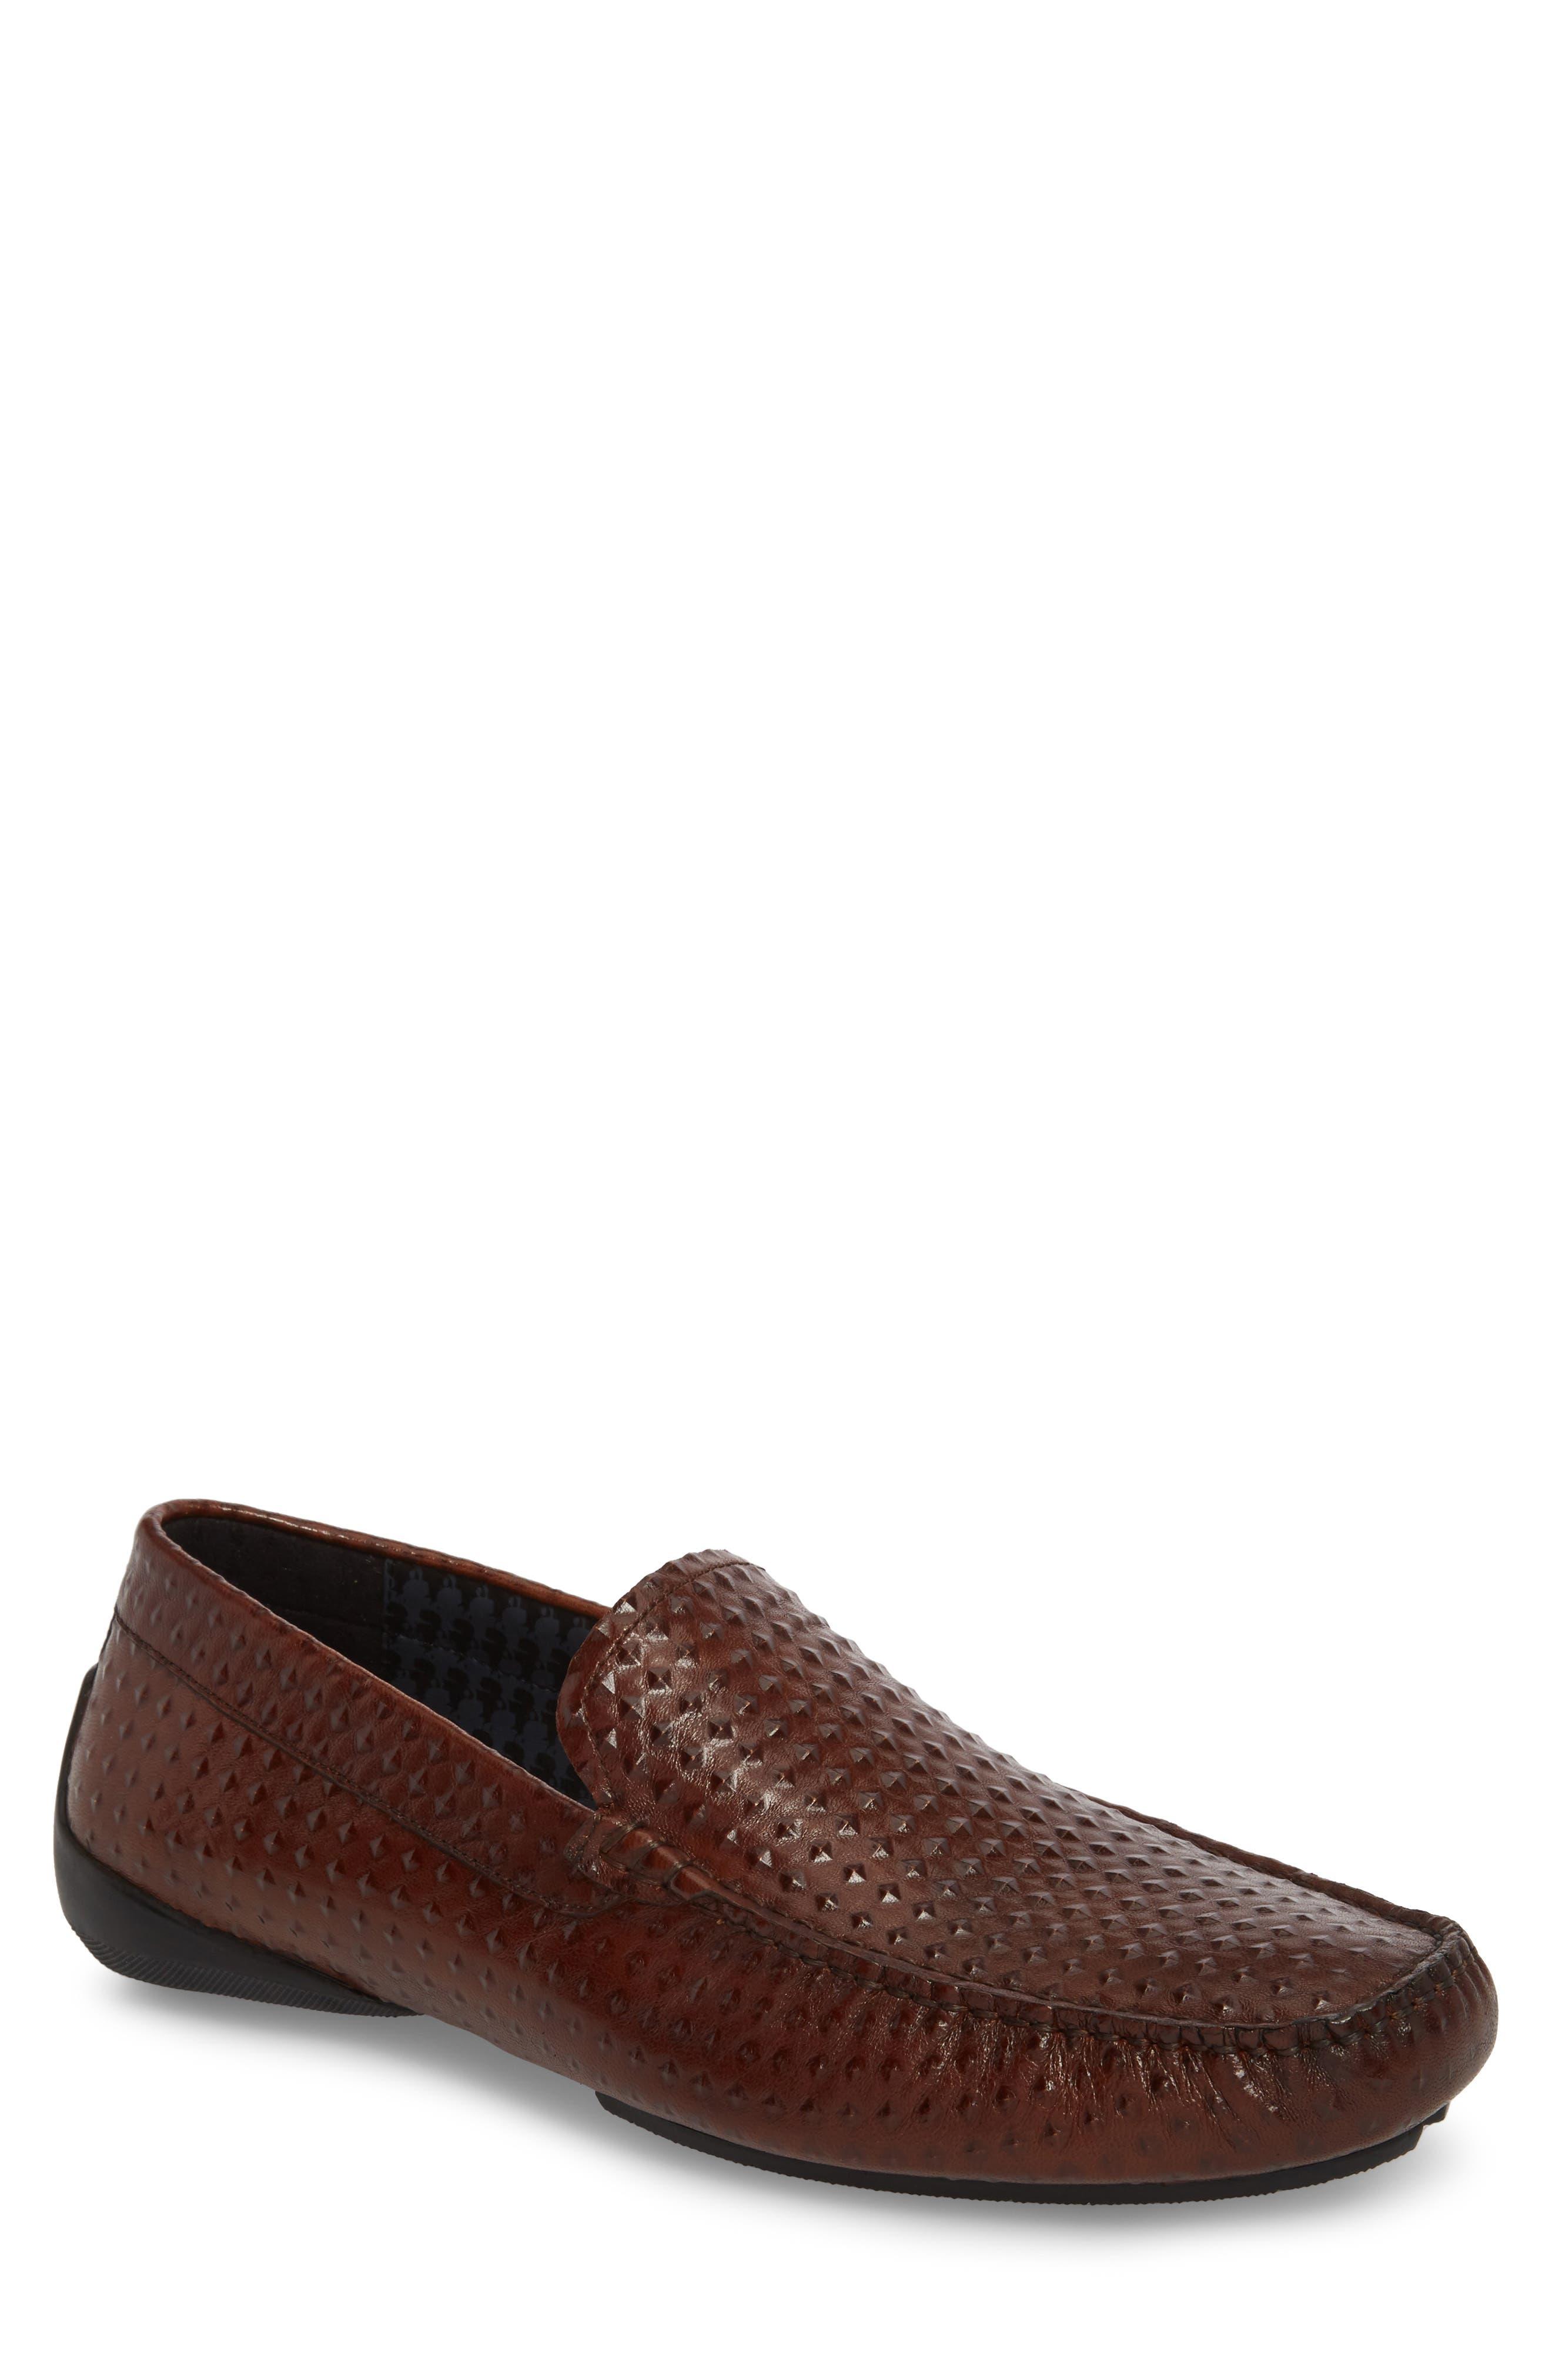 Karl Lagerfeld Men's Driving Shoe 0RlN6